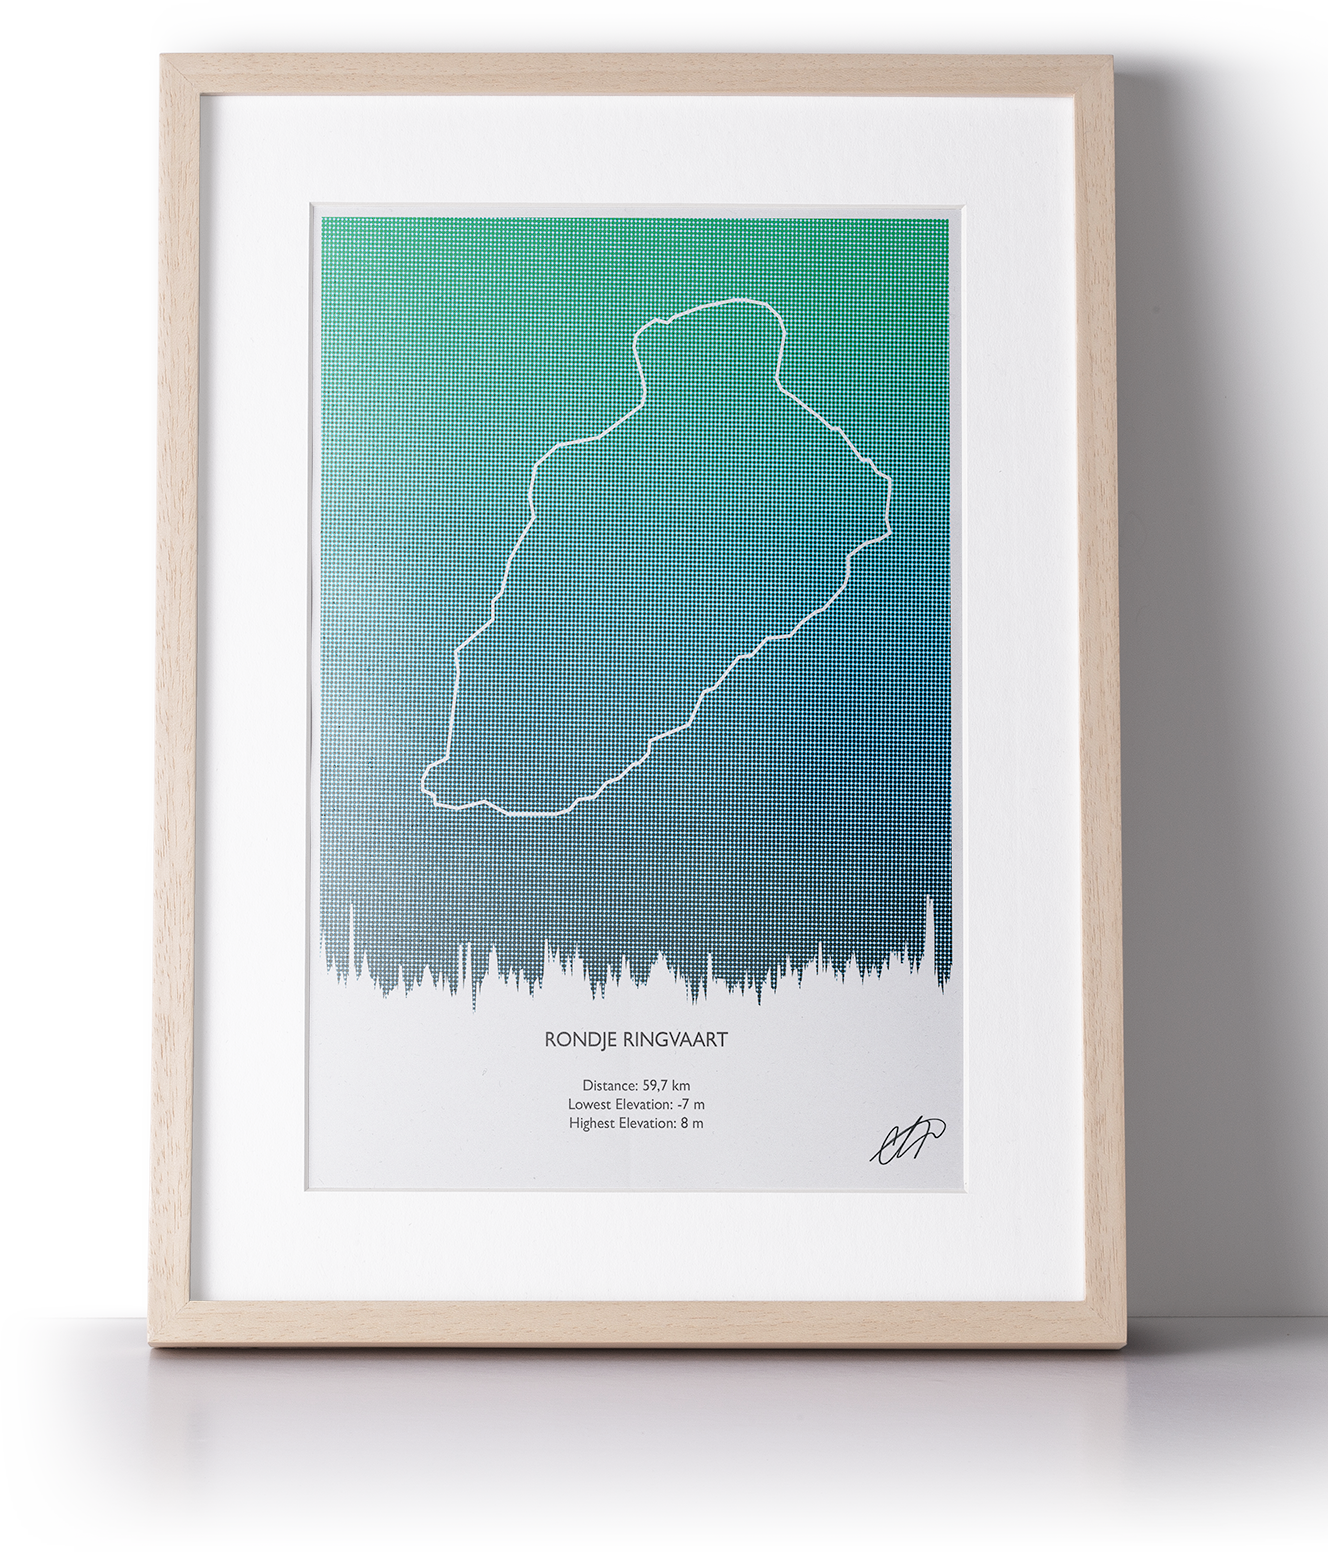 Print Rondje Ringvaart-1